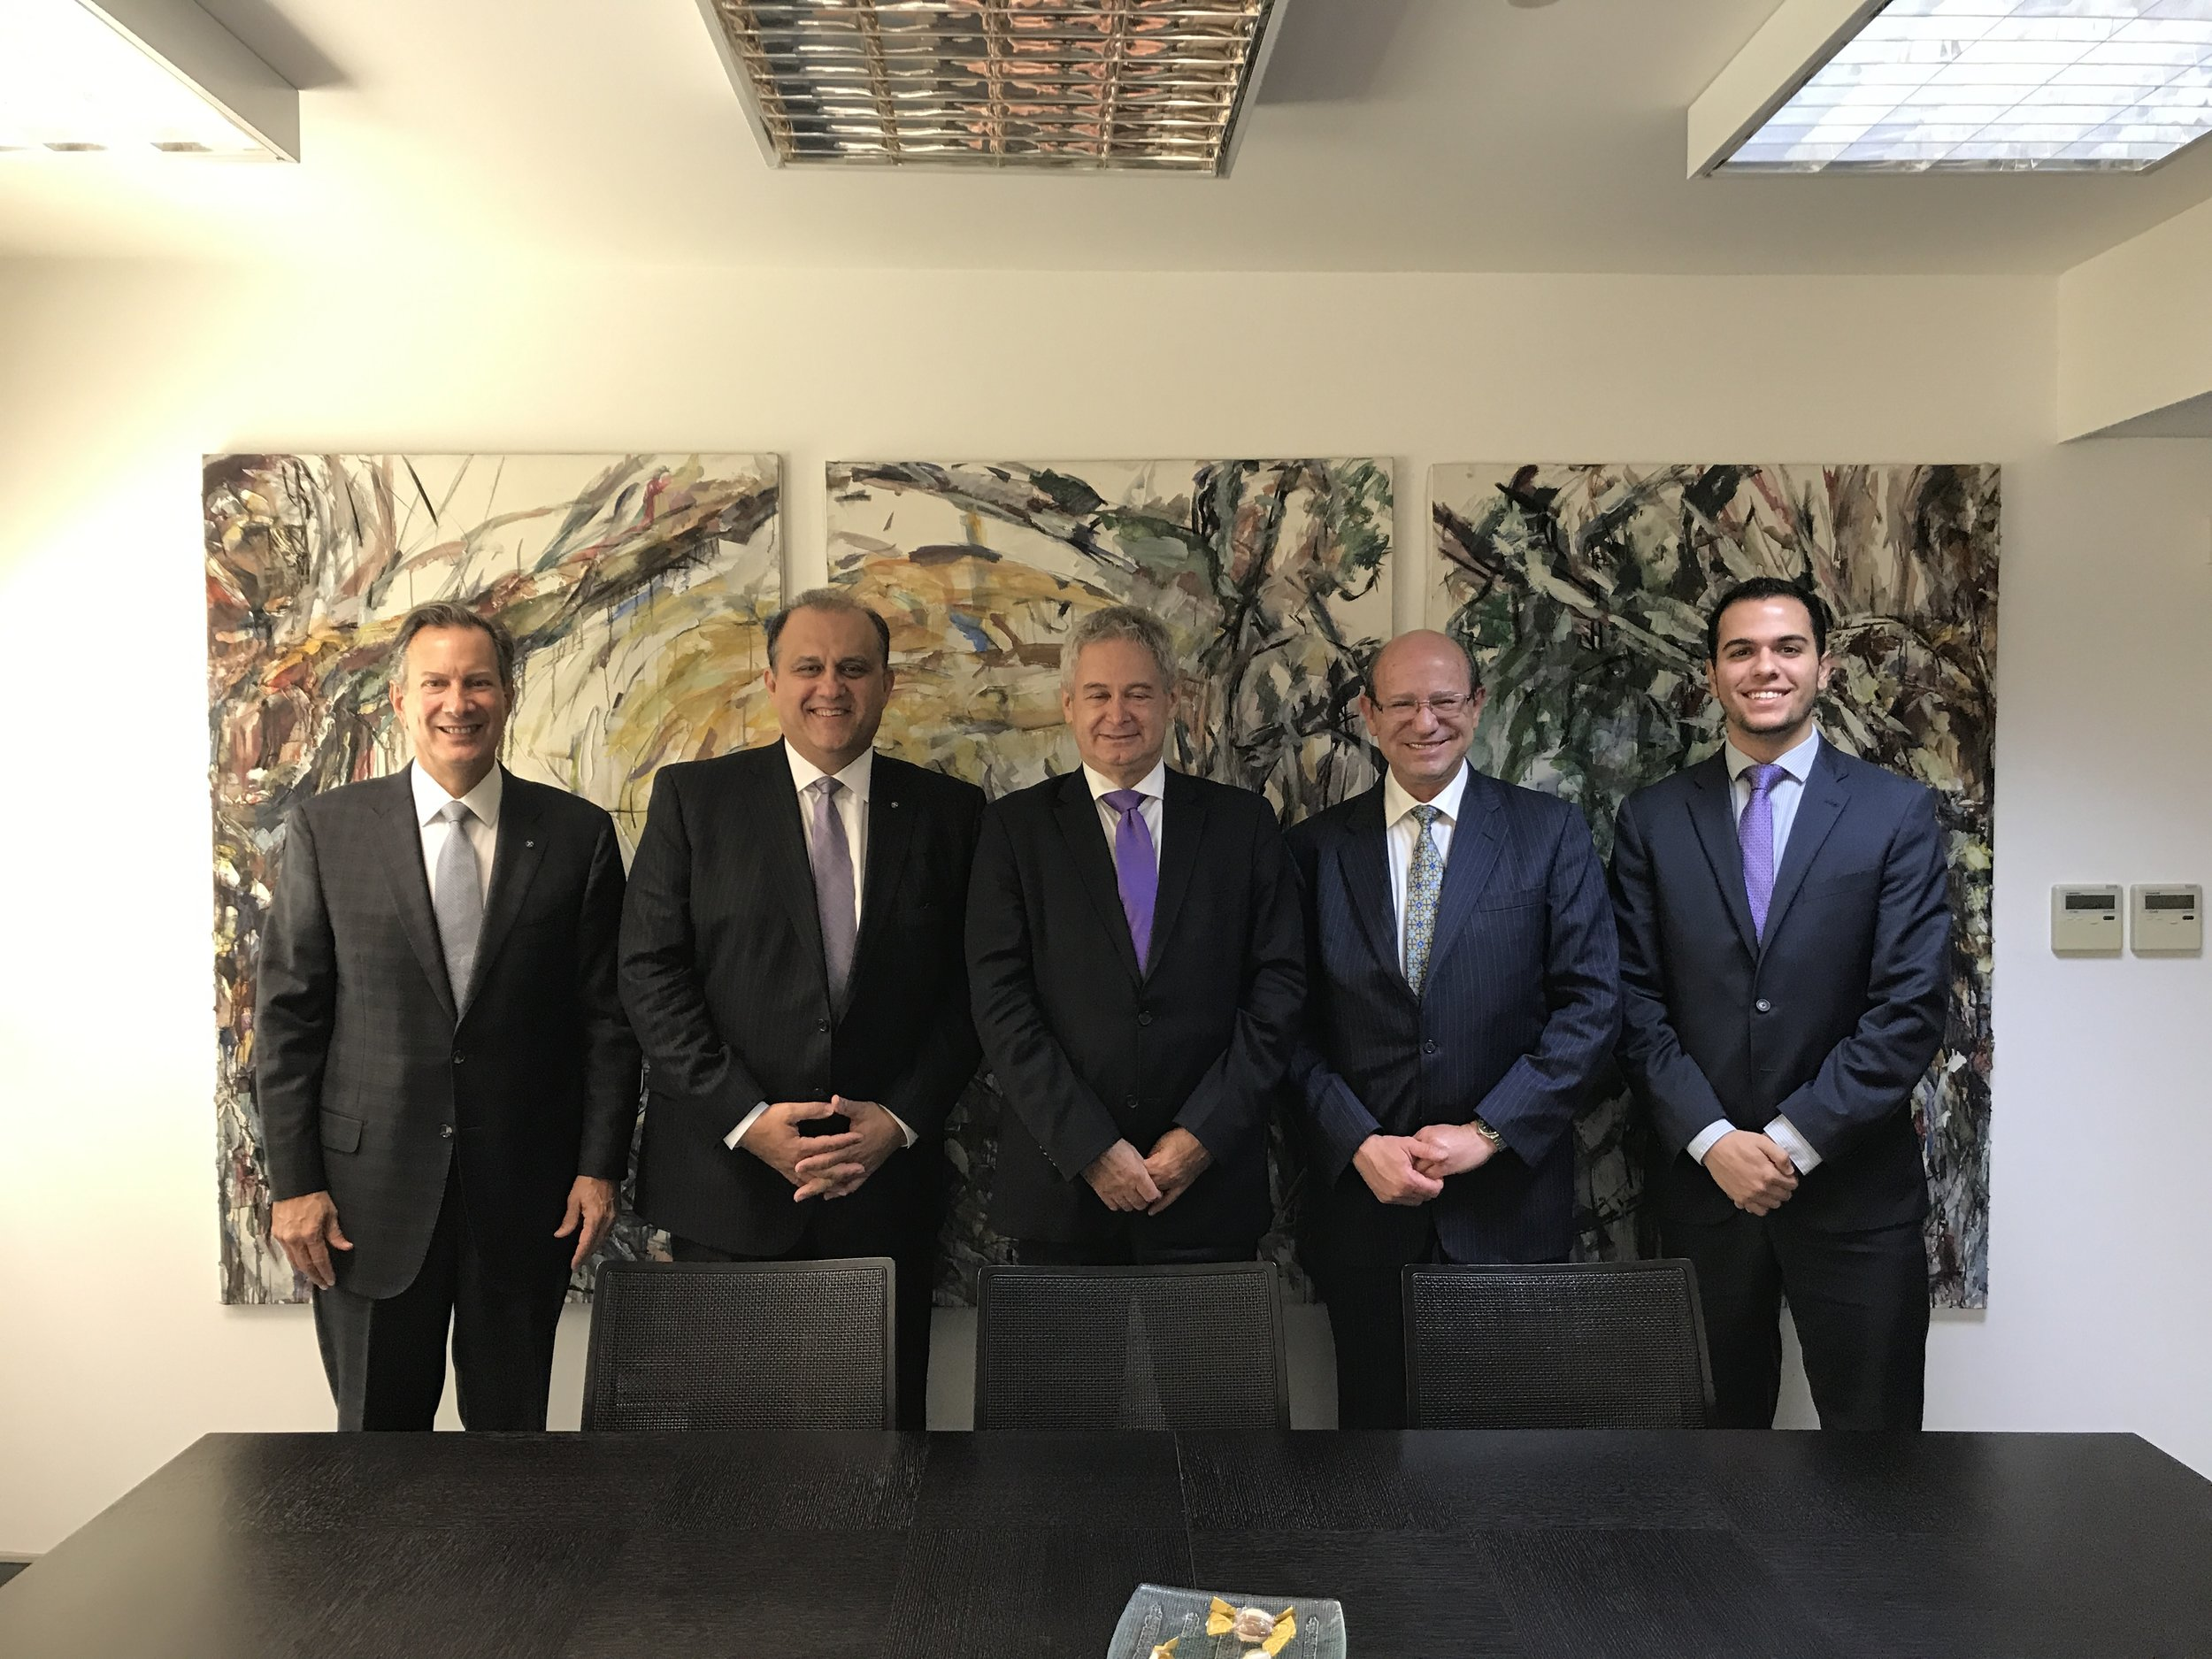 AHI Delegation with Ambassador Andreas Mavroyiannis, Greek Cypriot Negotiator for the Cyprus Problem